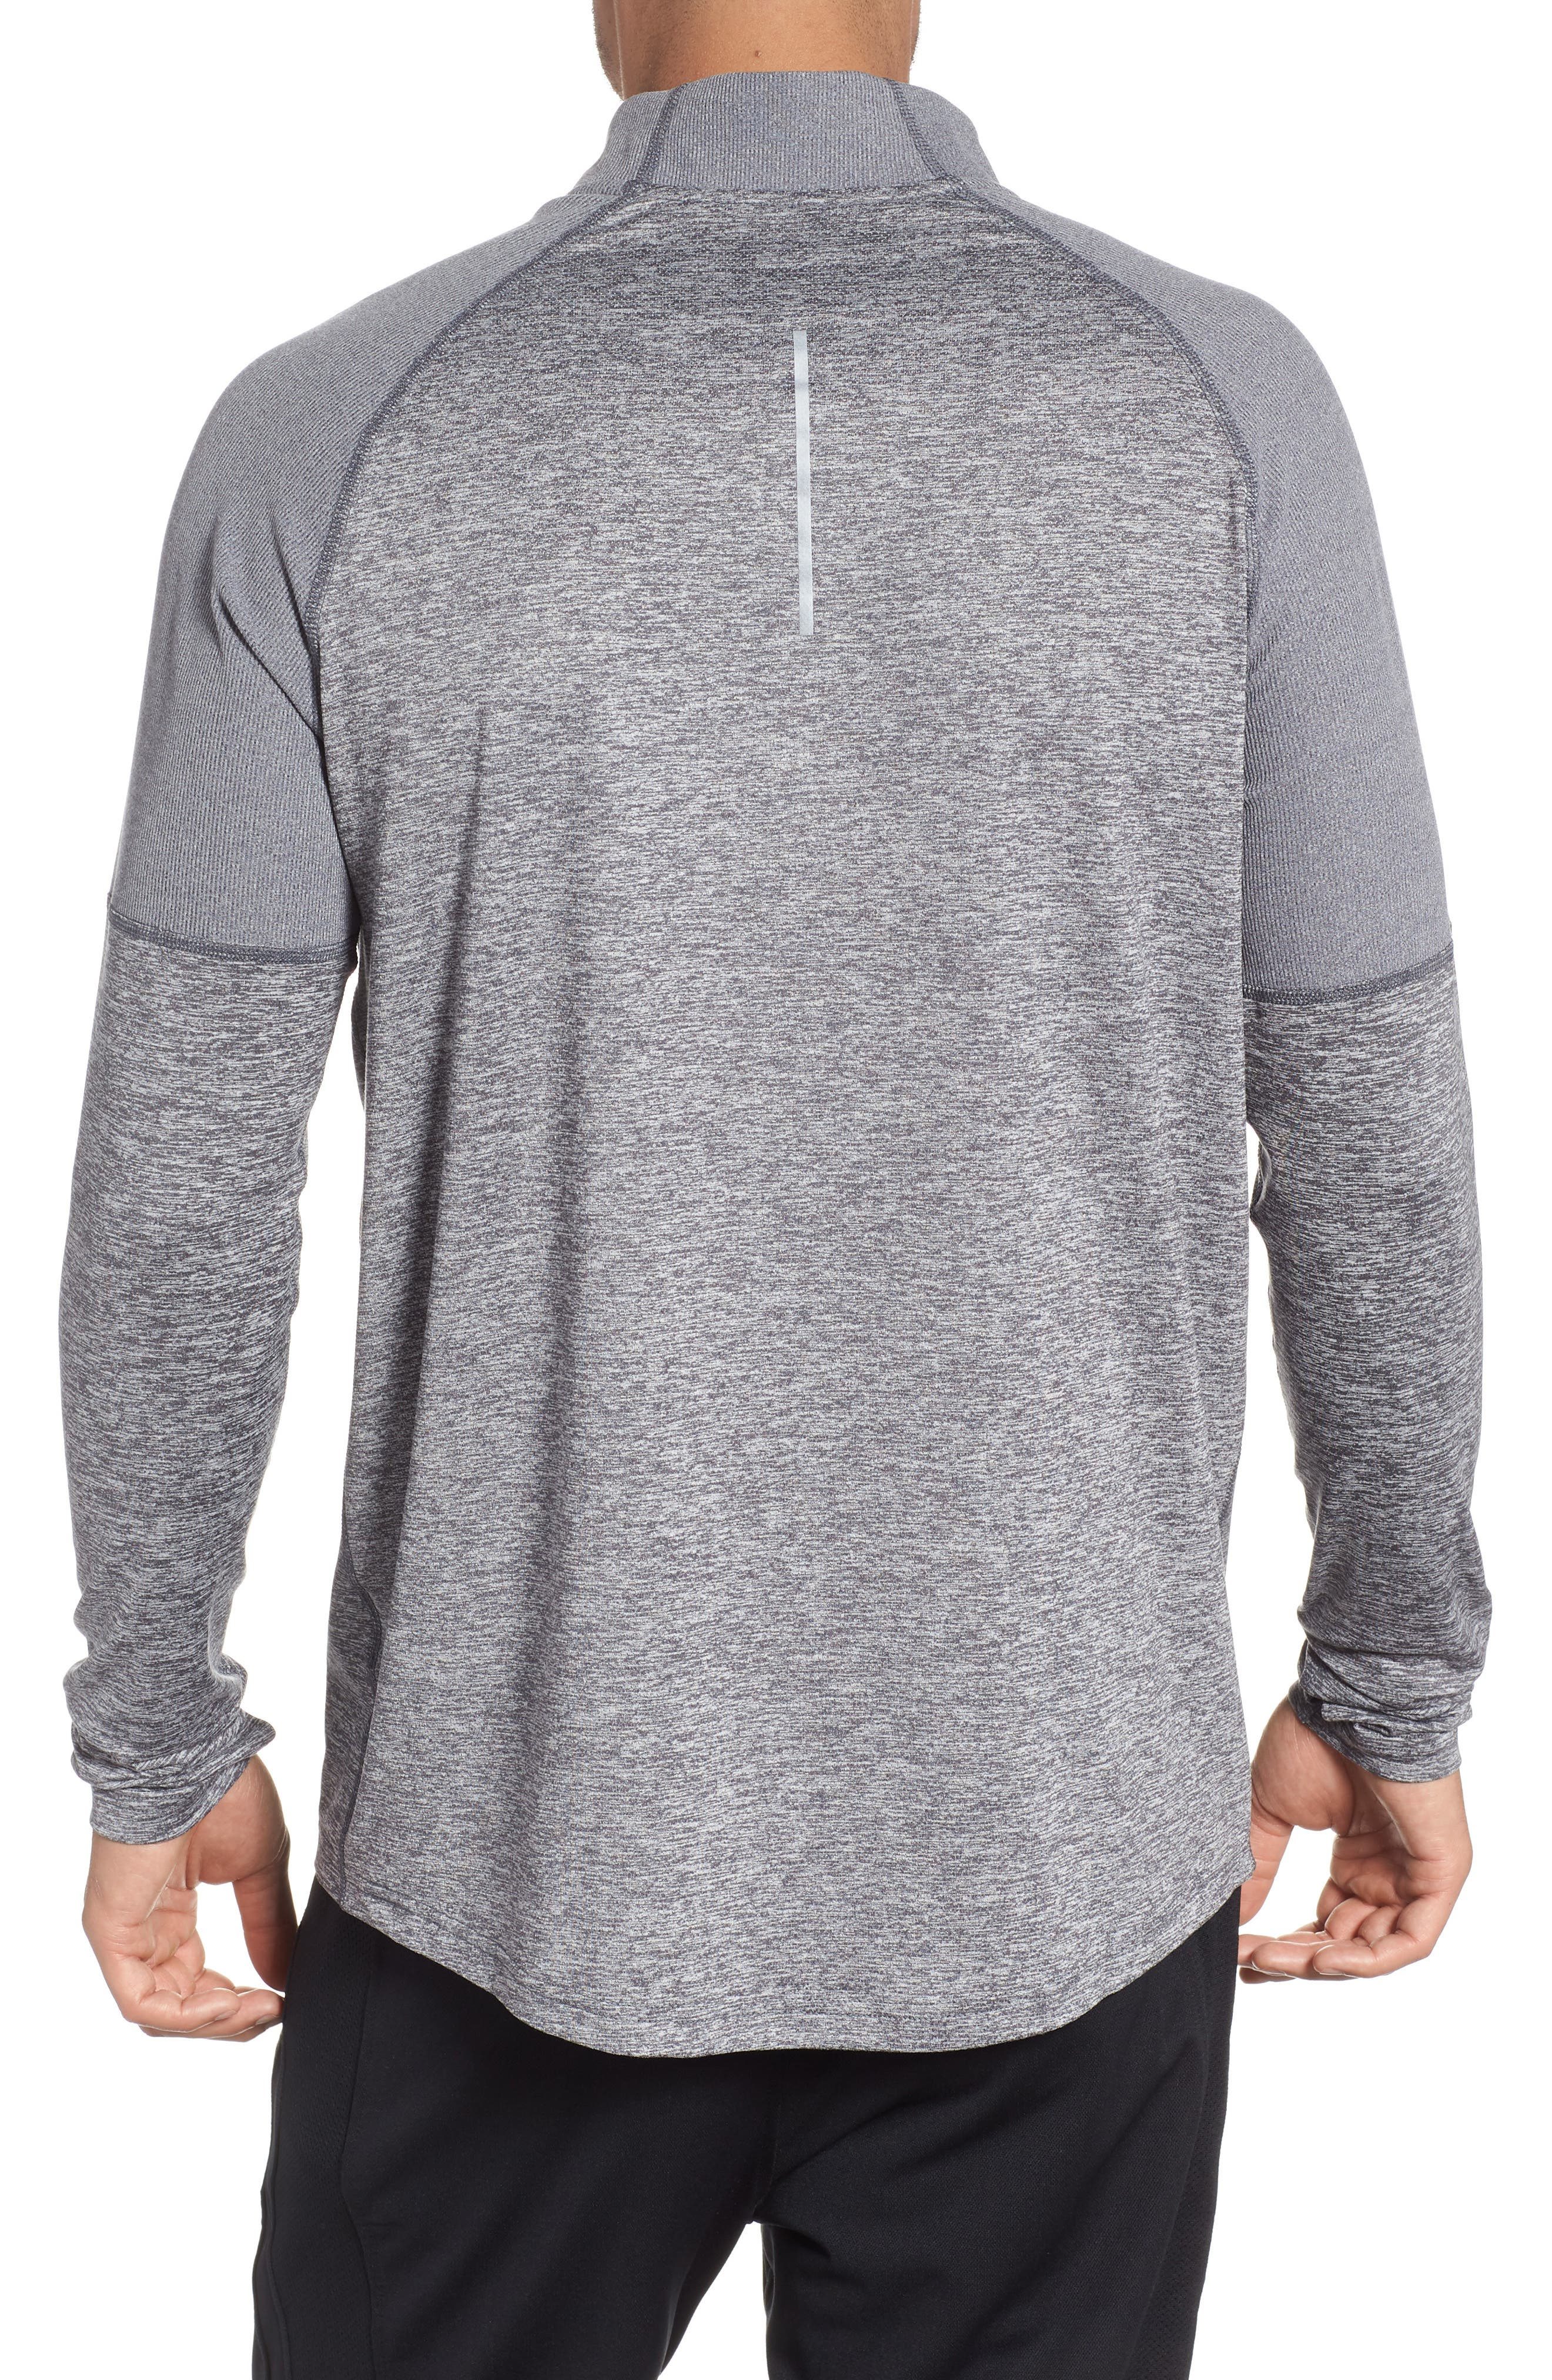 268aa507f48f Nike Hoodies   Sweatshirts for Men